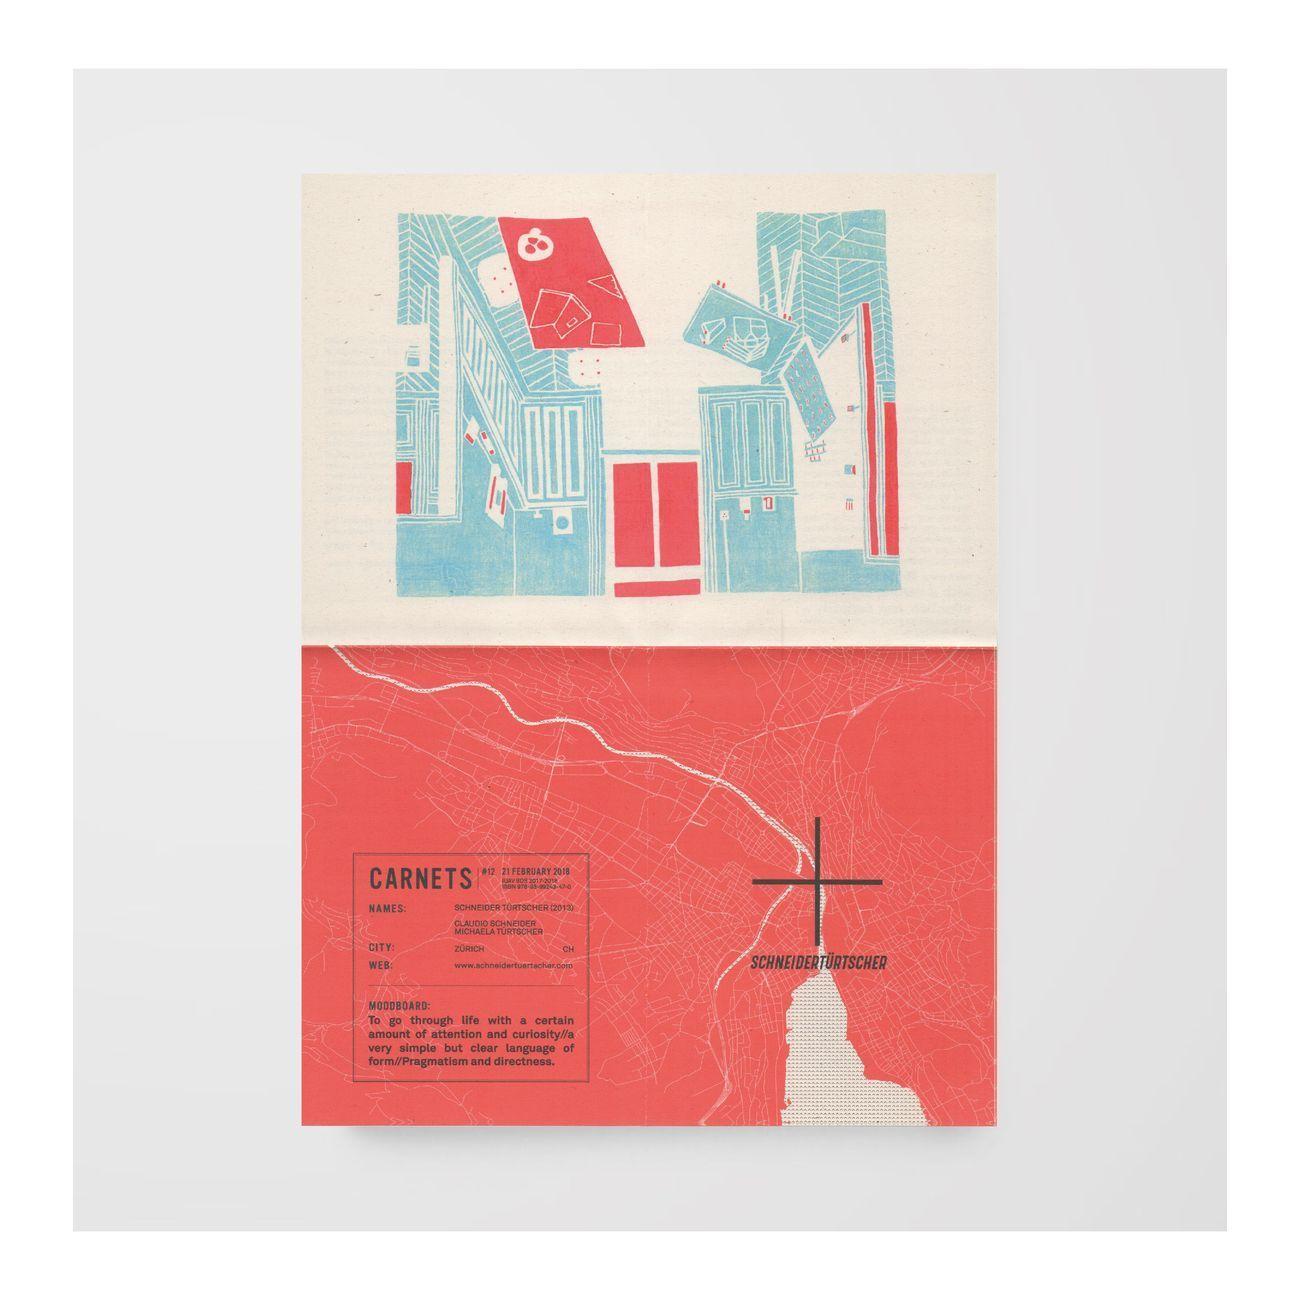 CARNETS - Architecture Is Just a Pretext (Anteferma, Venezia 2019) _formella